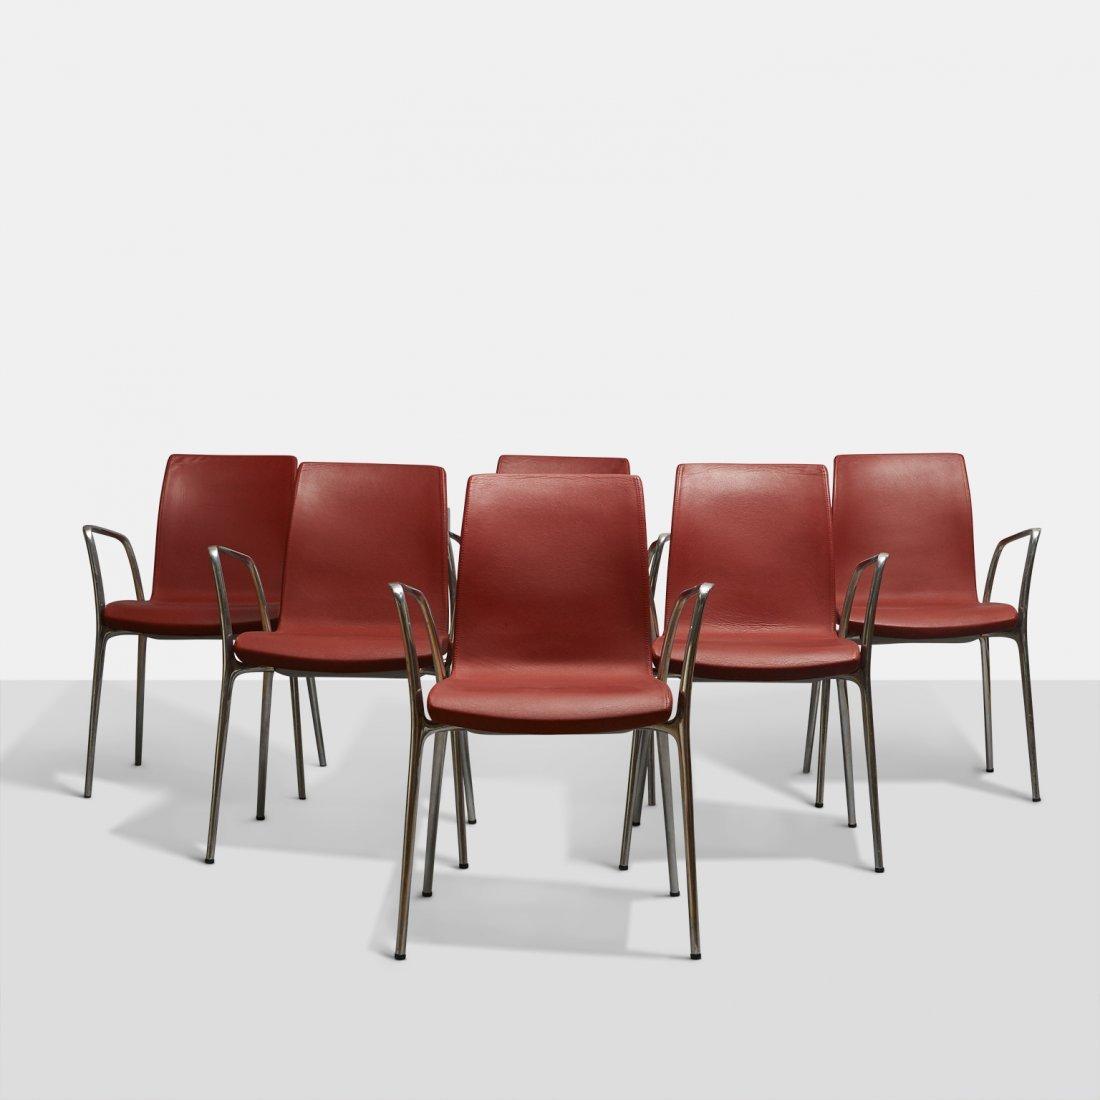 Jorge Pensi, Set of Six Gorka Chairs